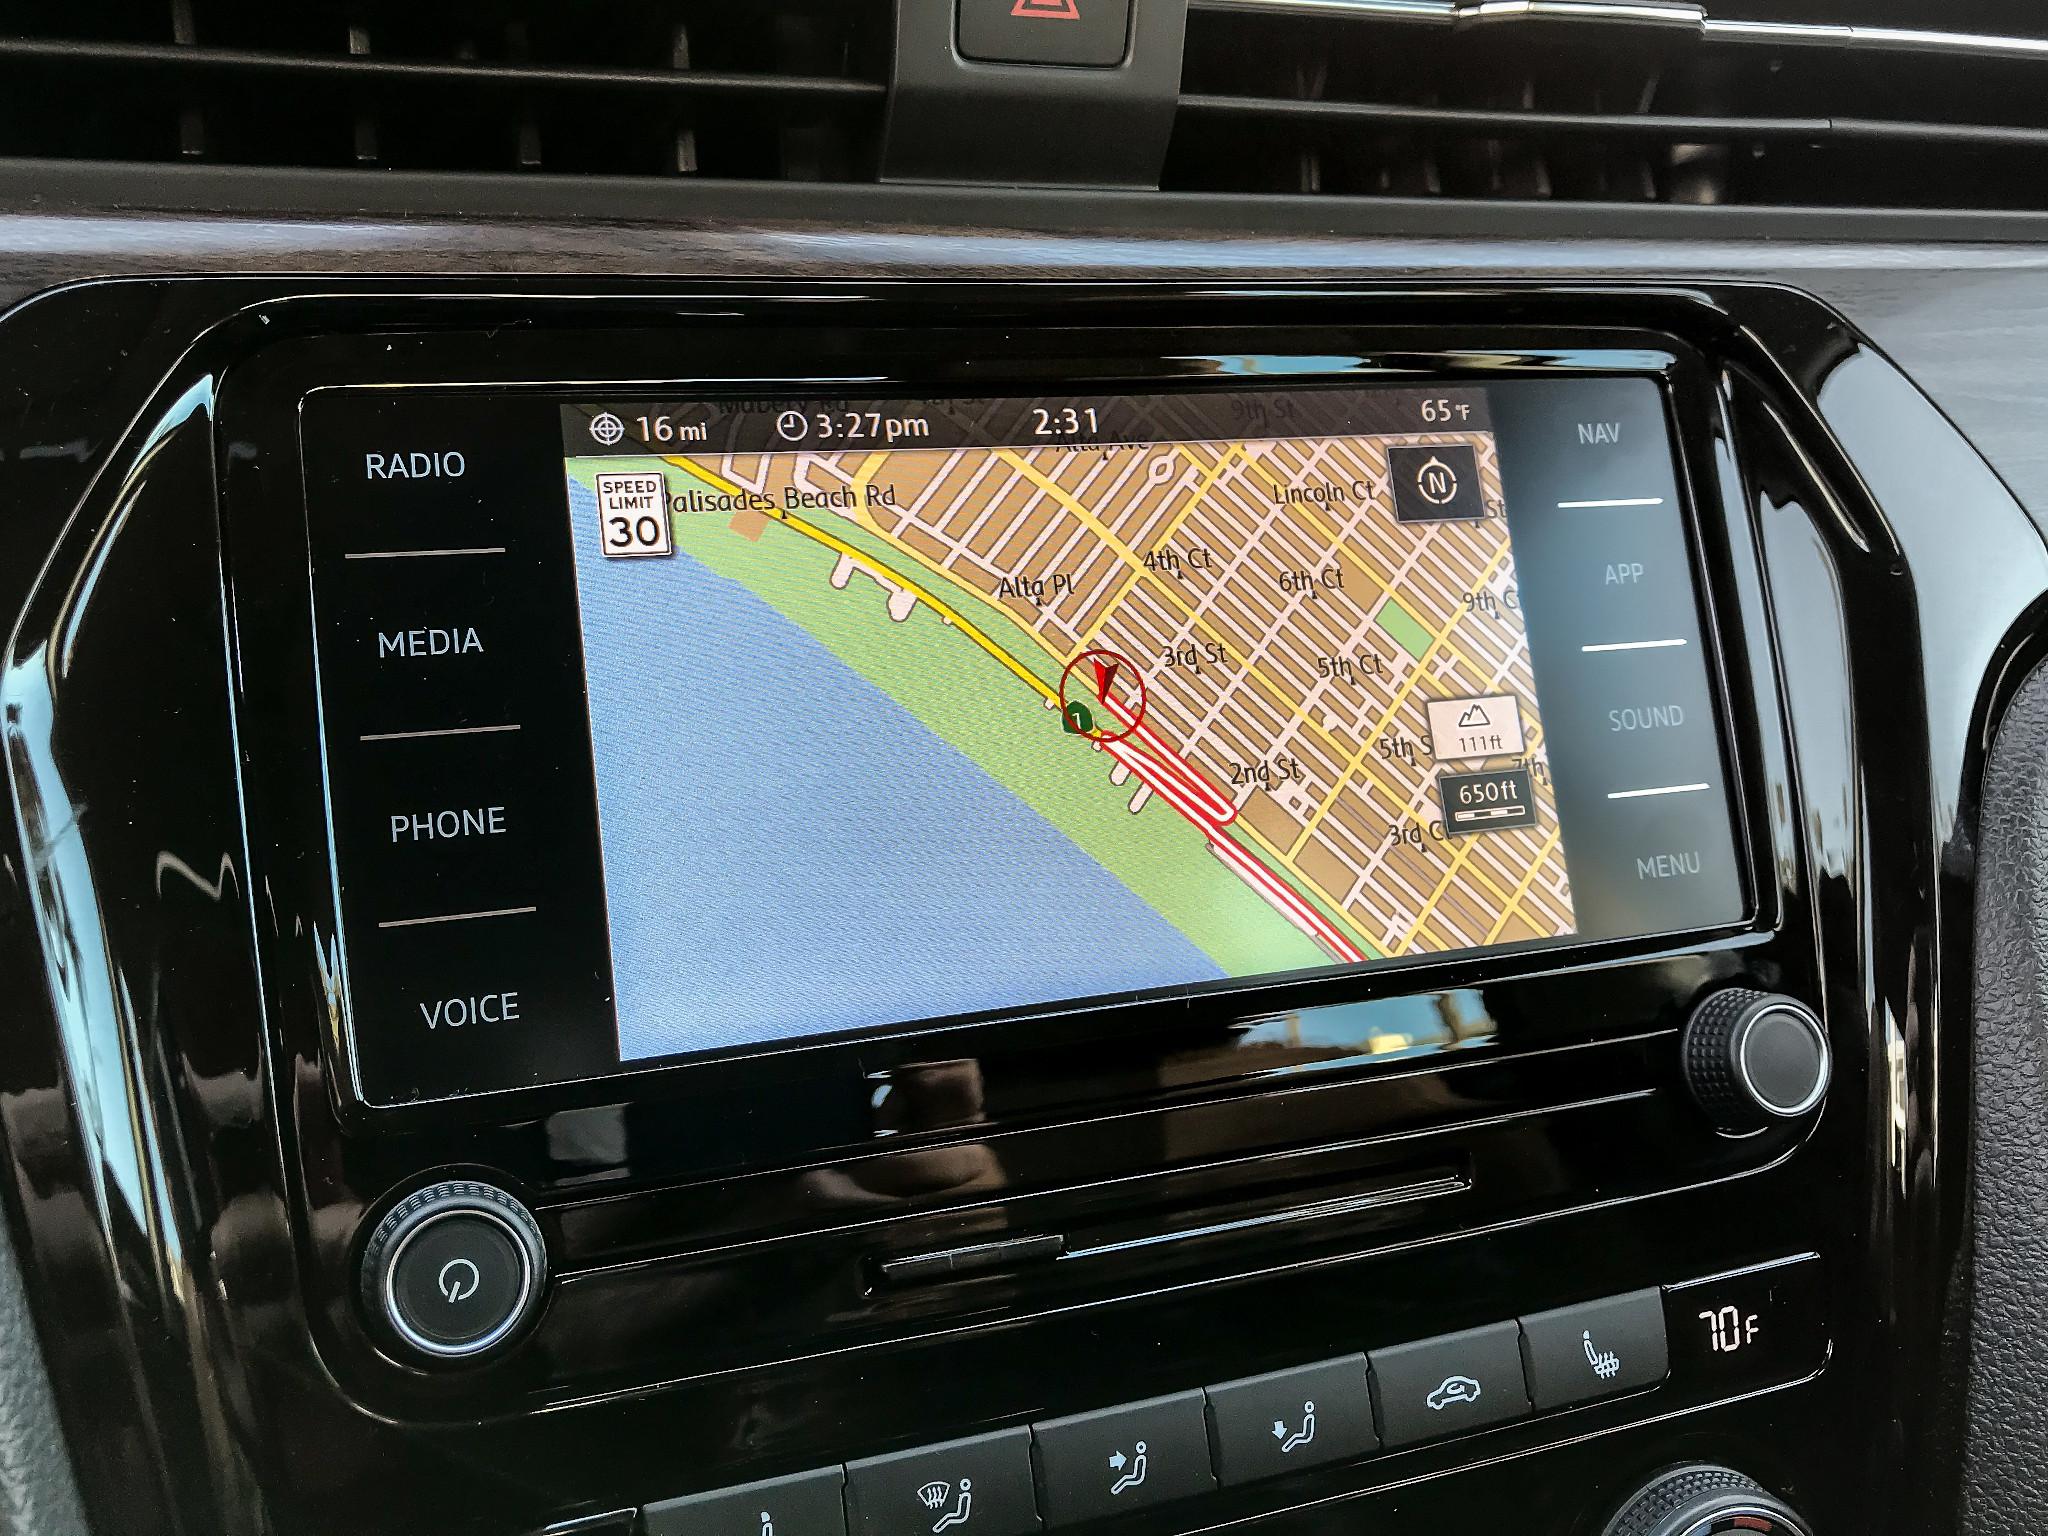 volkswagen-passat-2020-15-center-stack-display--front-row--interior--navigation.jpg